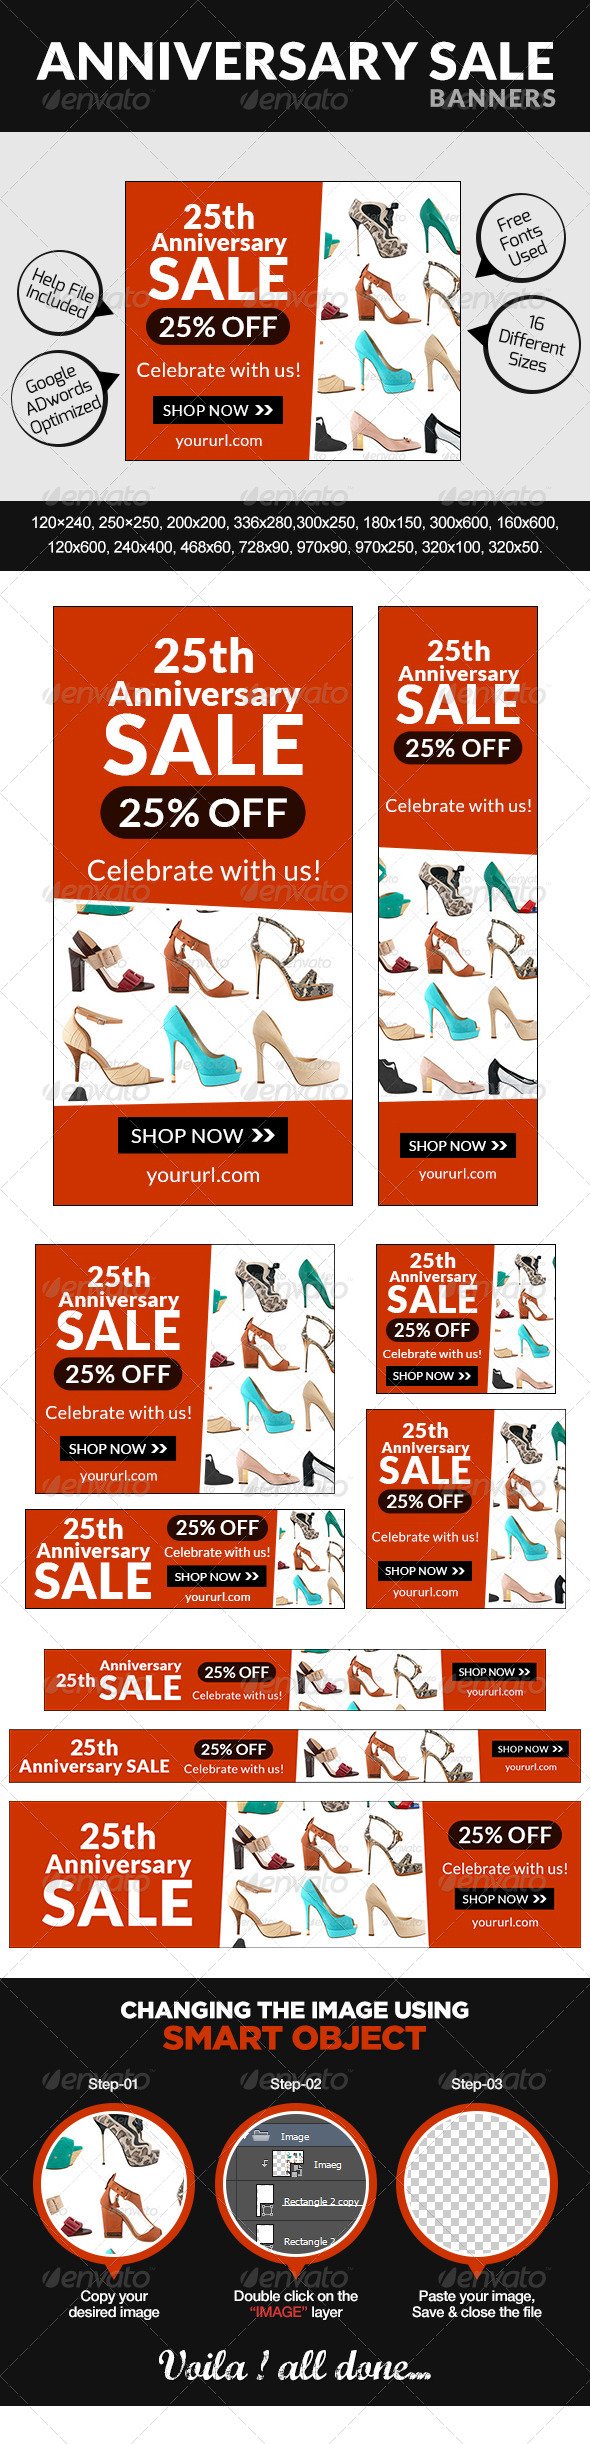 GraphicRiver Anniversary Sale Banners 7641717